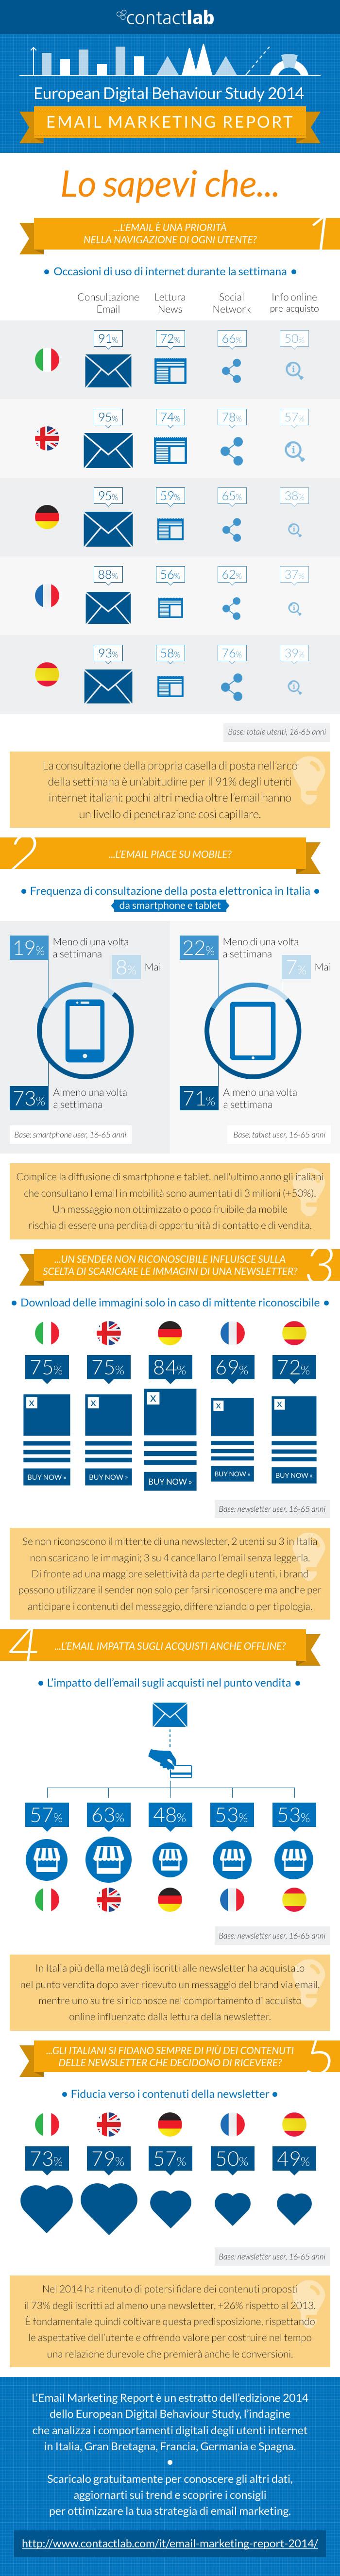 European Digital Behaviour Study   Email Marketing Report